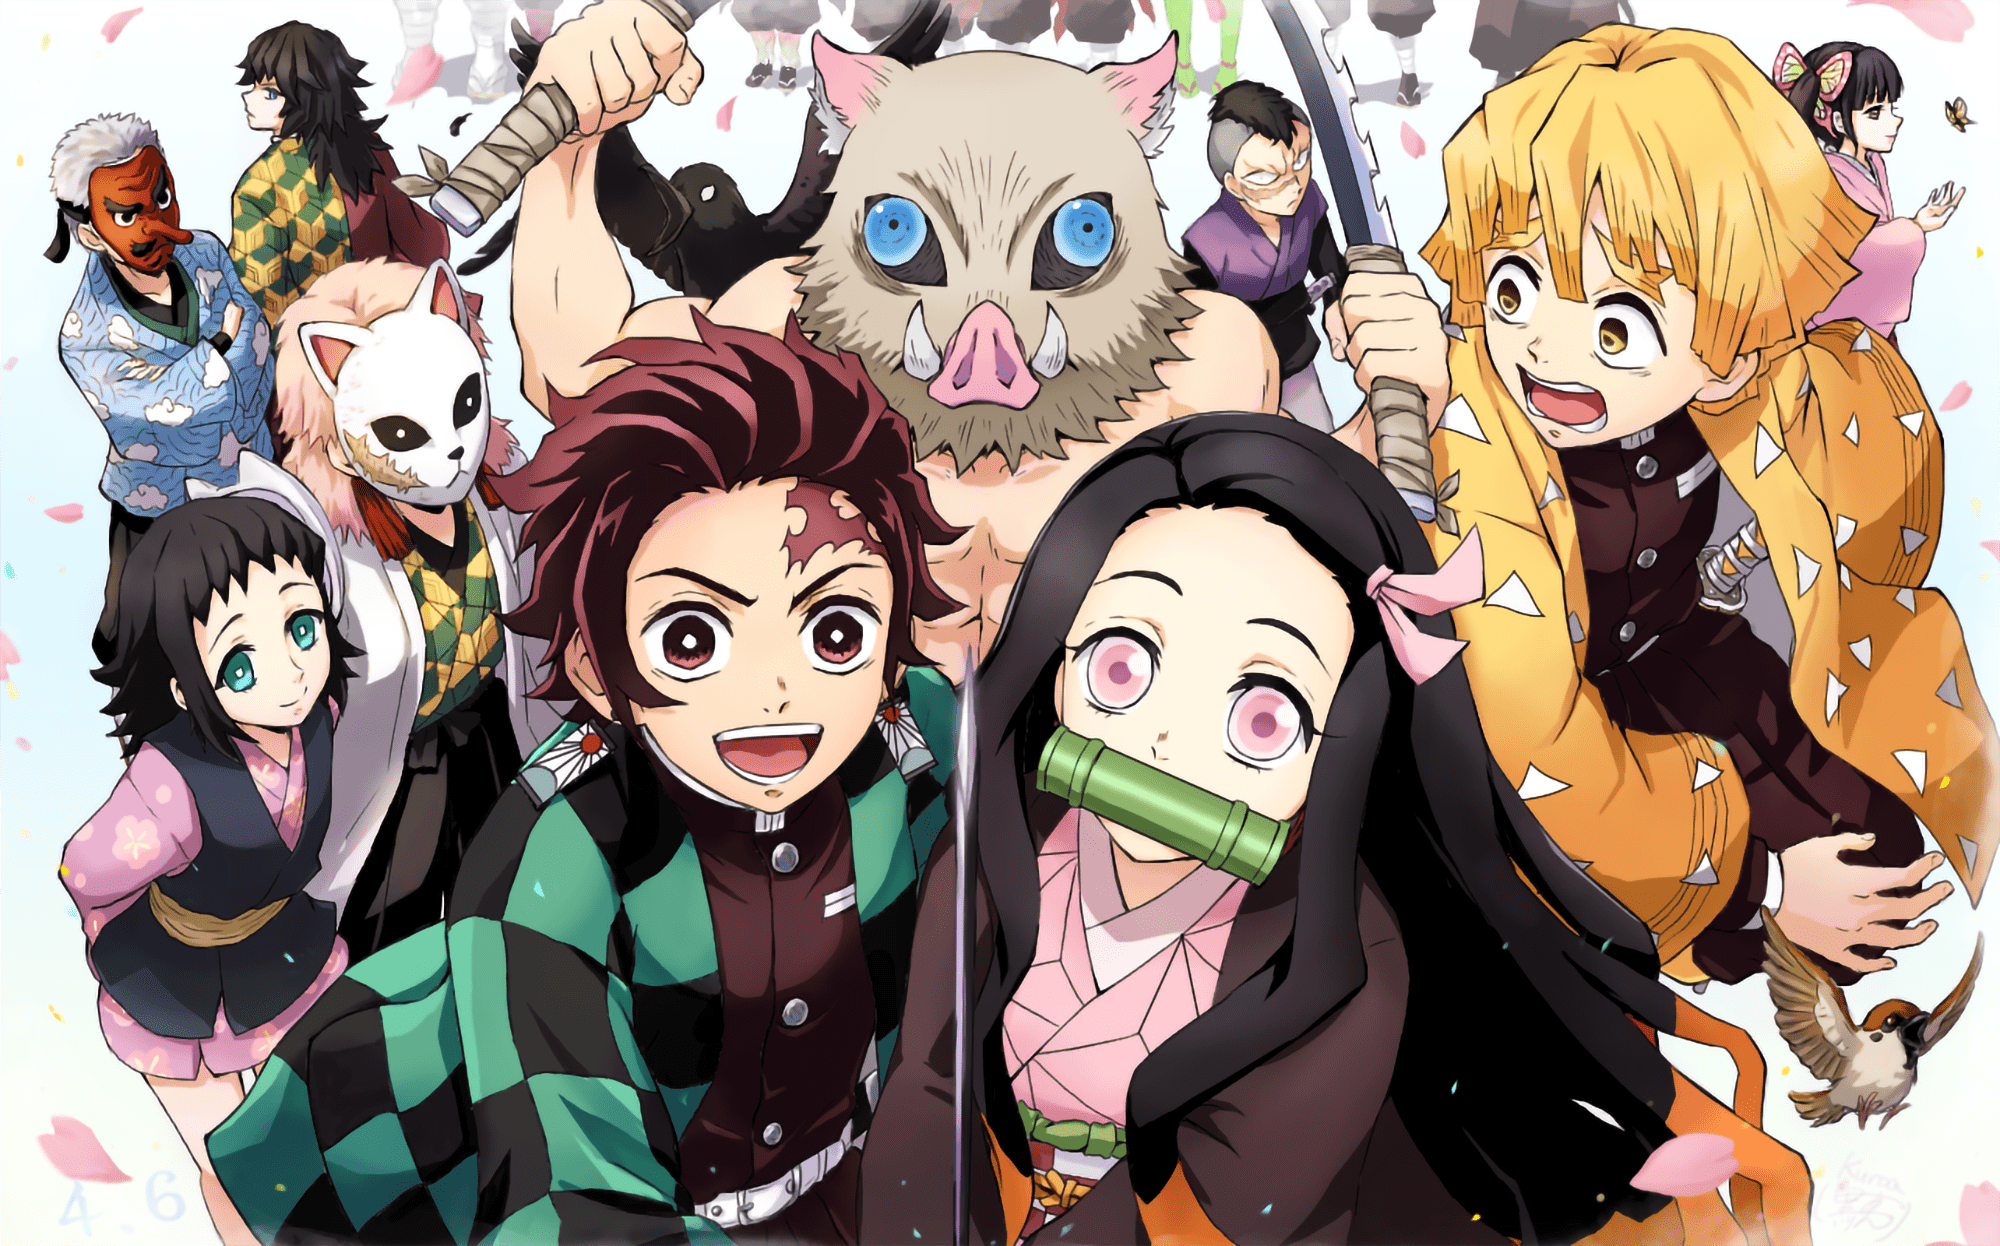 Kimetsu No Yaiba Jadi Anime Yang Paling Banyak Ditonton di Abad 21